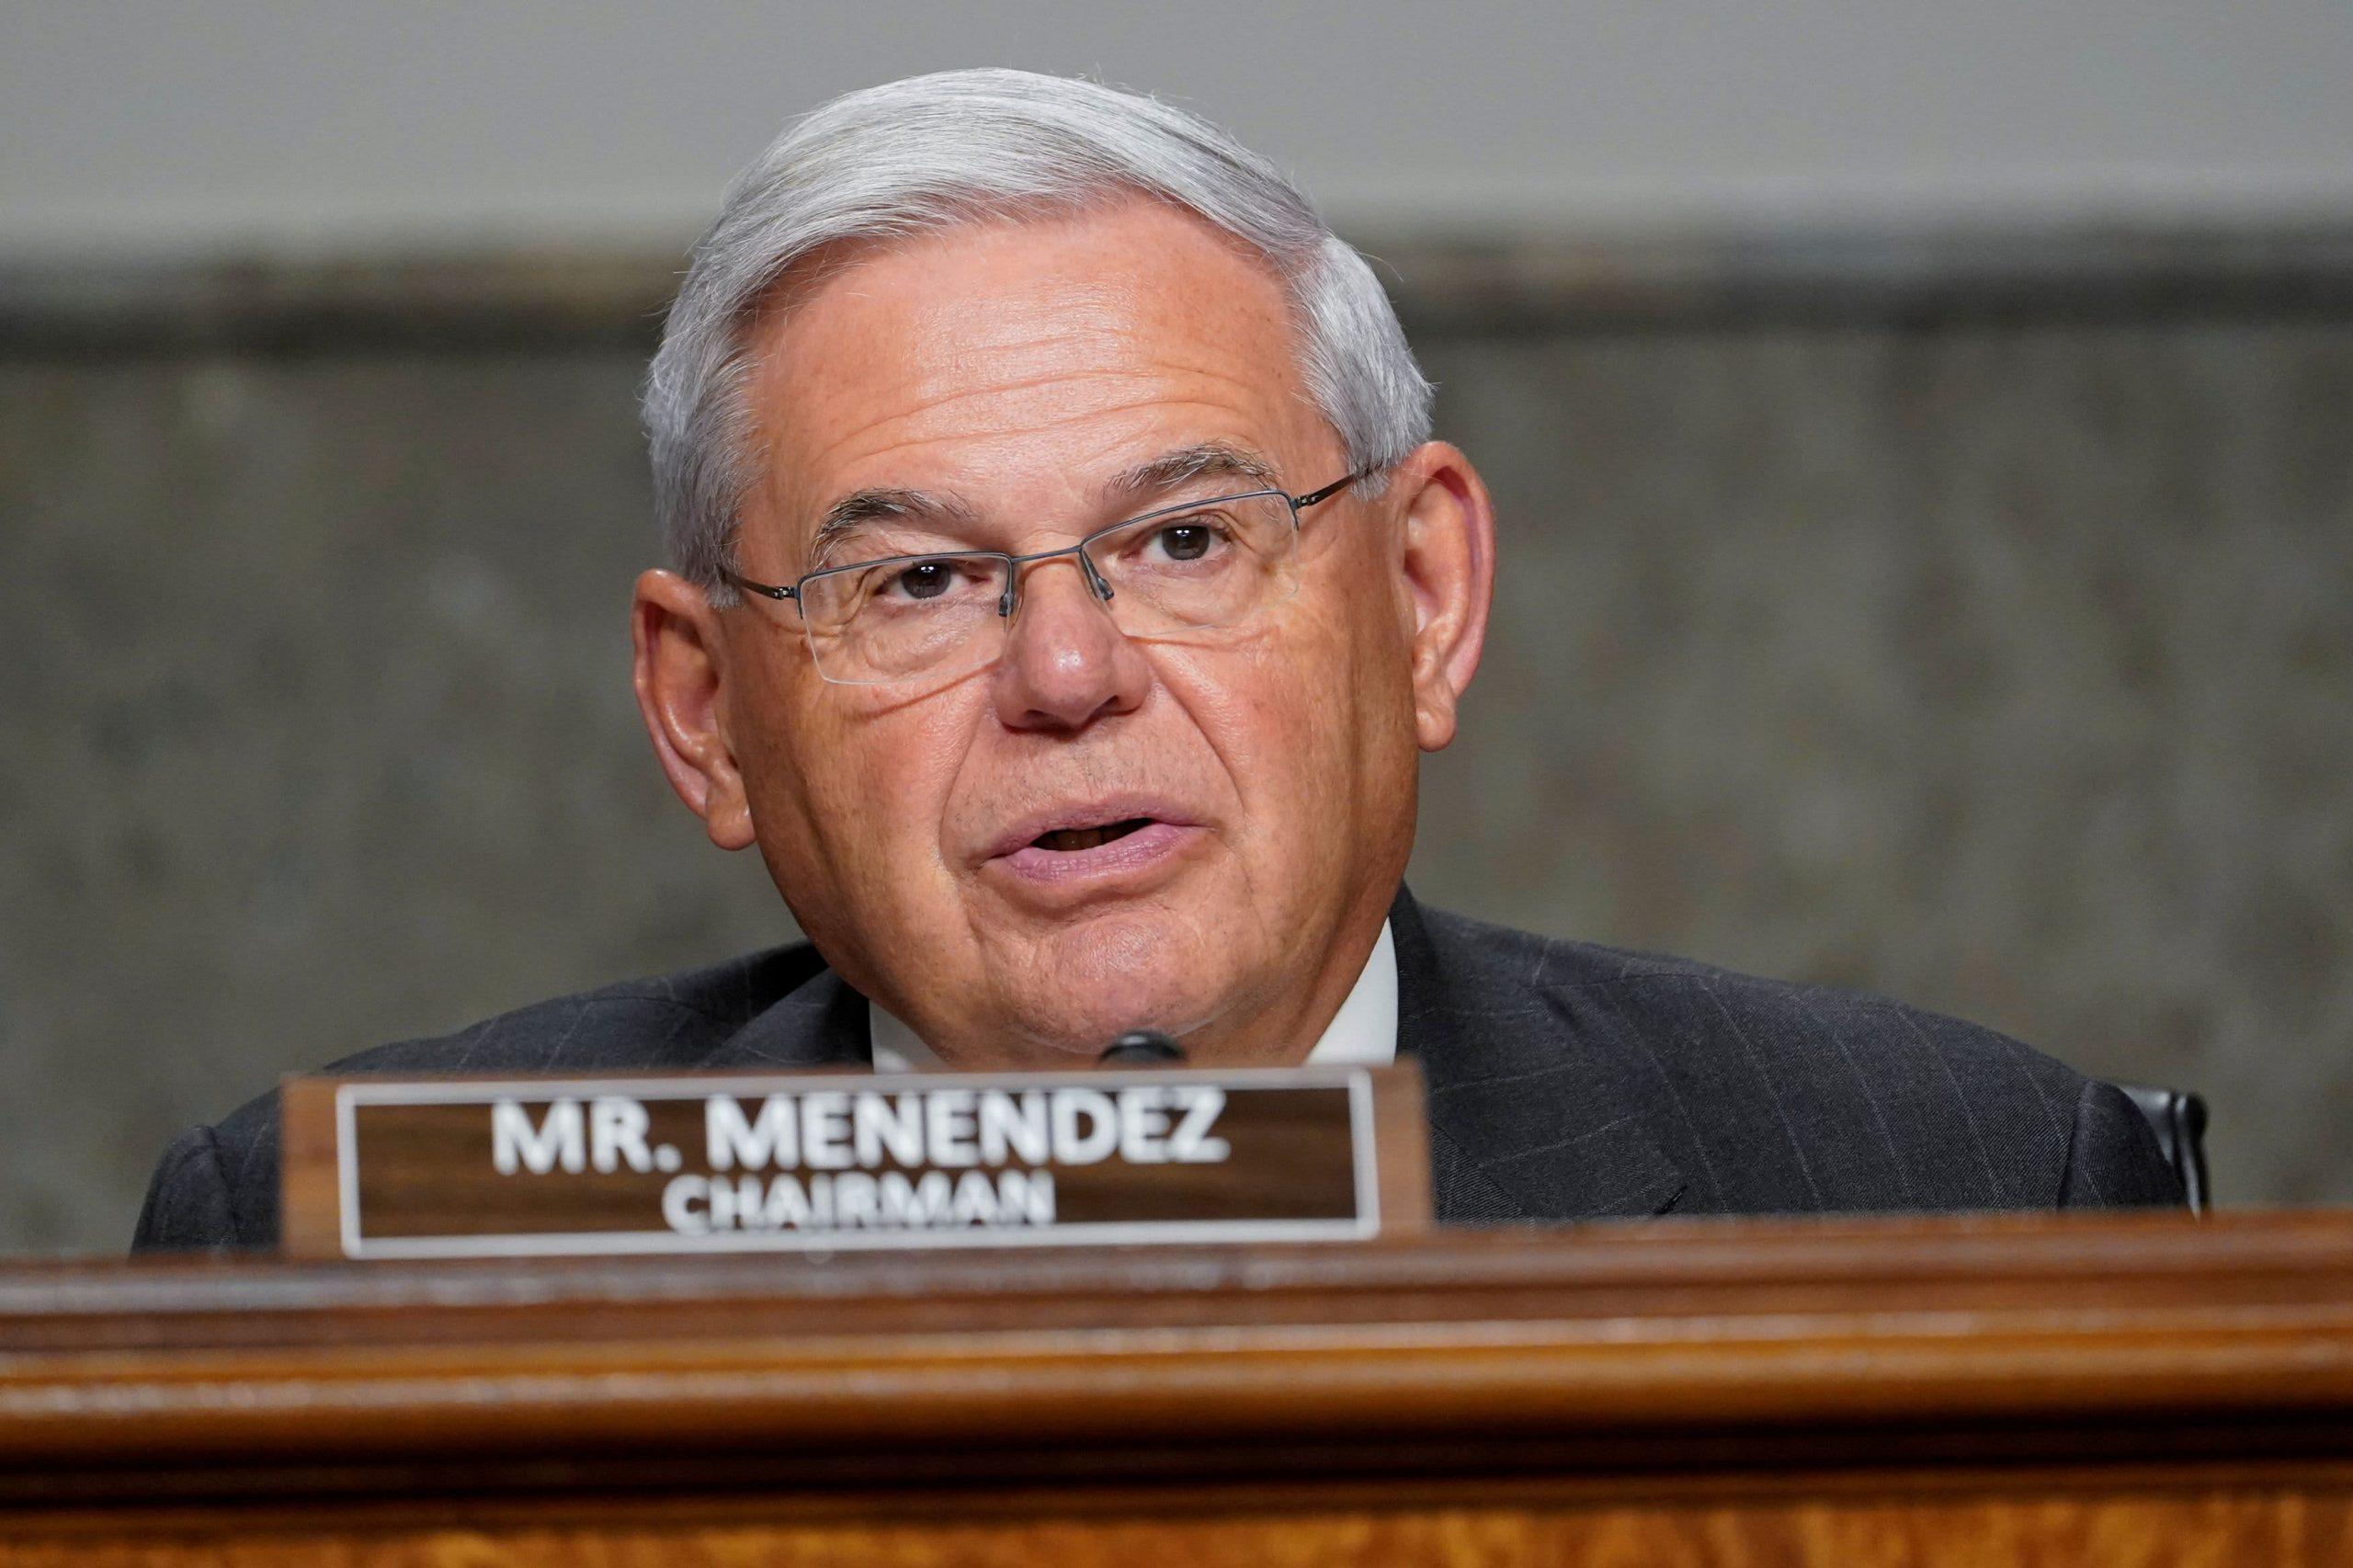 JEWISH STANDARD: Menendez urges focus on Iran